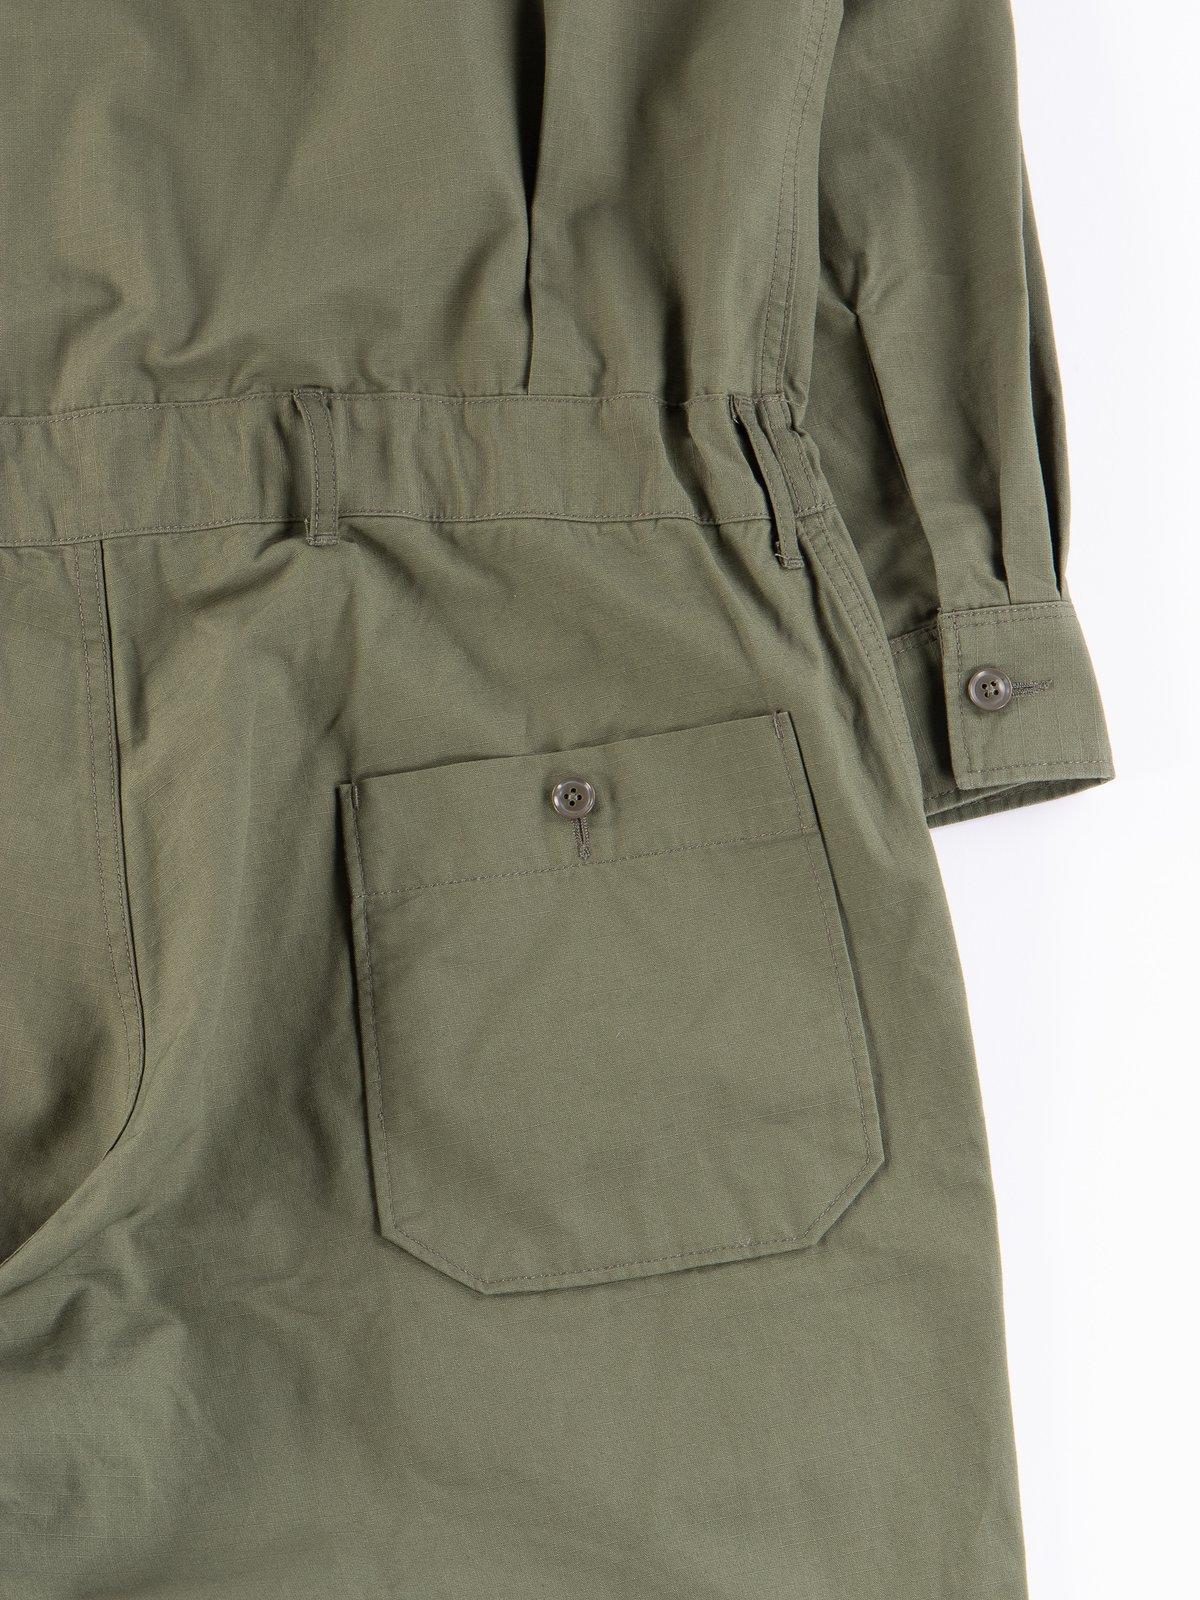 Olive Cotton Ripstop Boiler Suit - Image 7